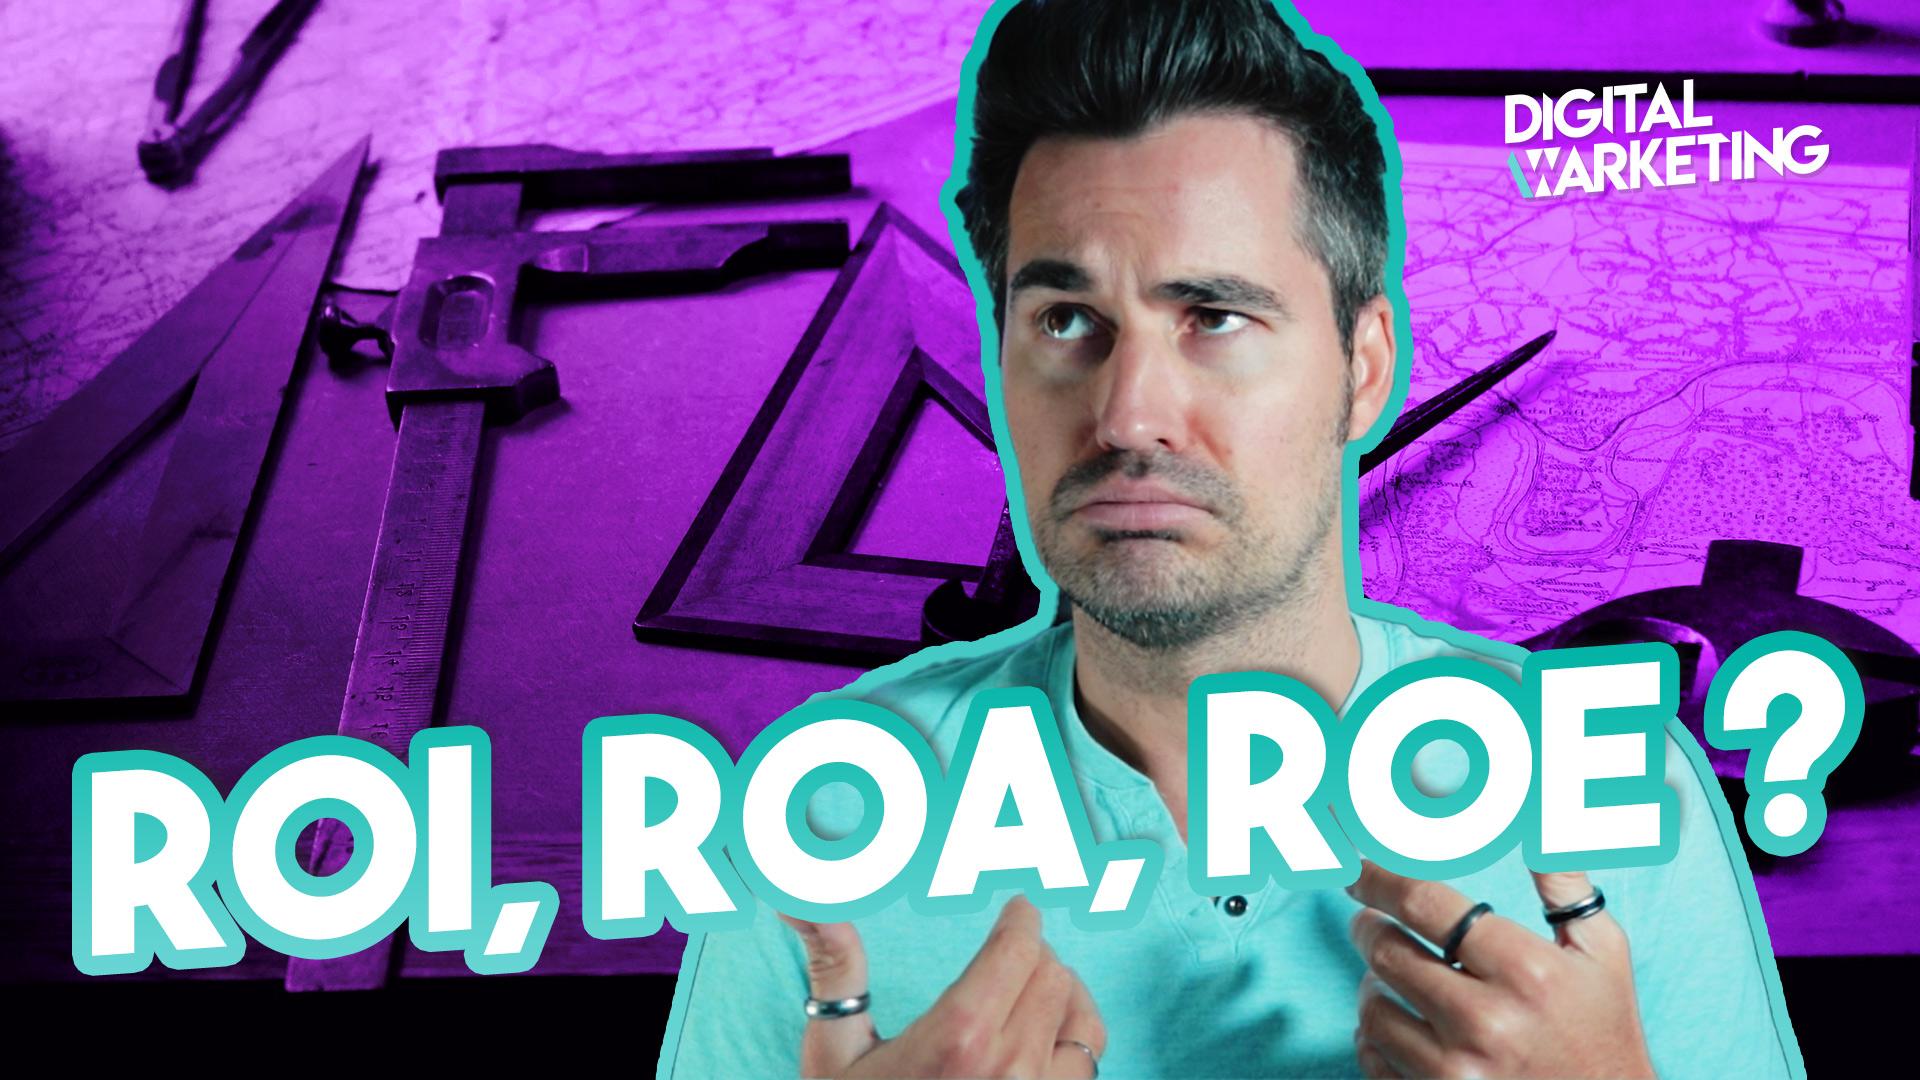 Performance marketing digital : comment la mesurer – ROI, ROA, ROE